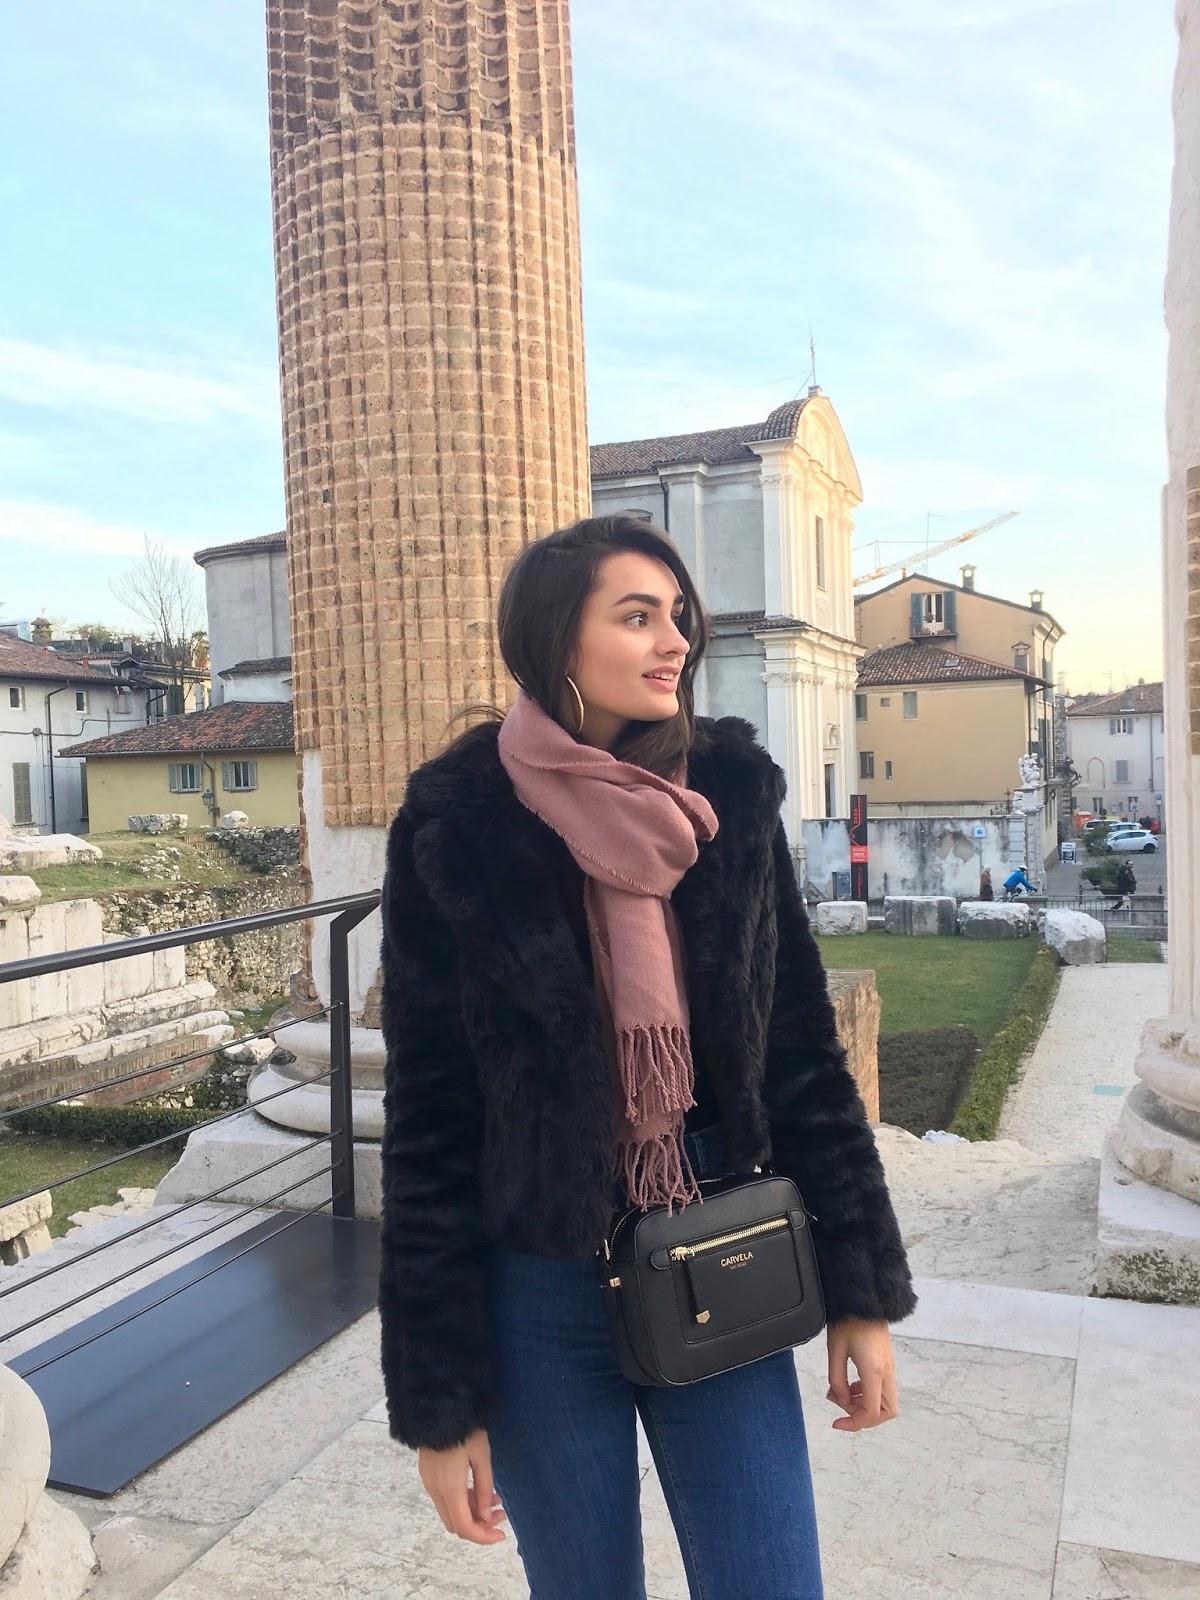 brescia travel style blogger peexo